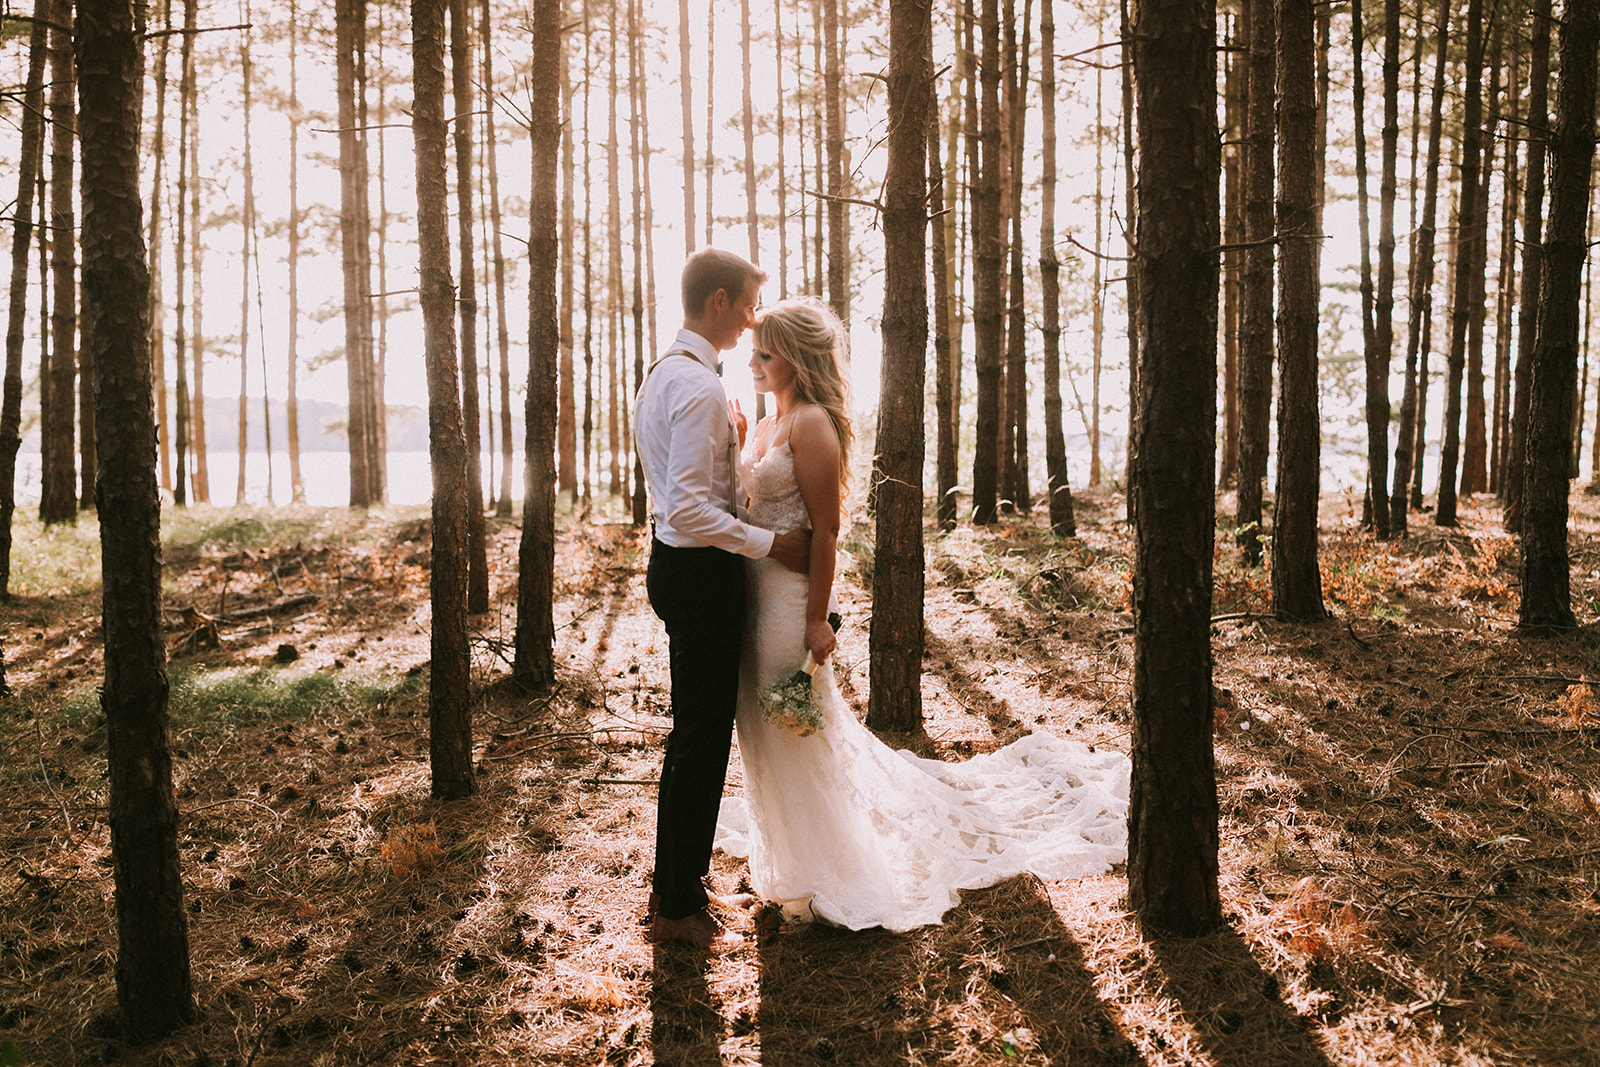 bohemian wedding shoot with beautiful light